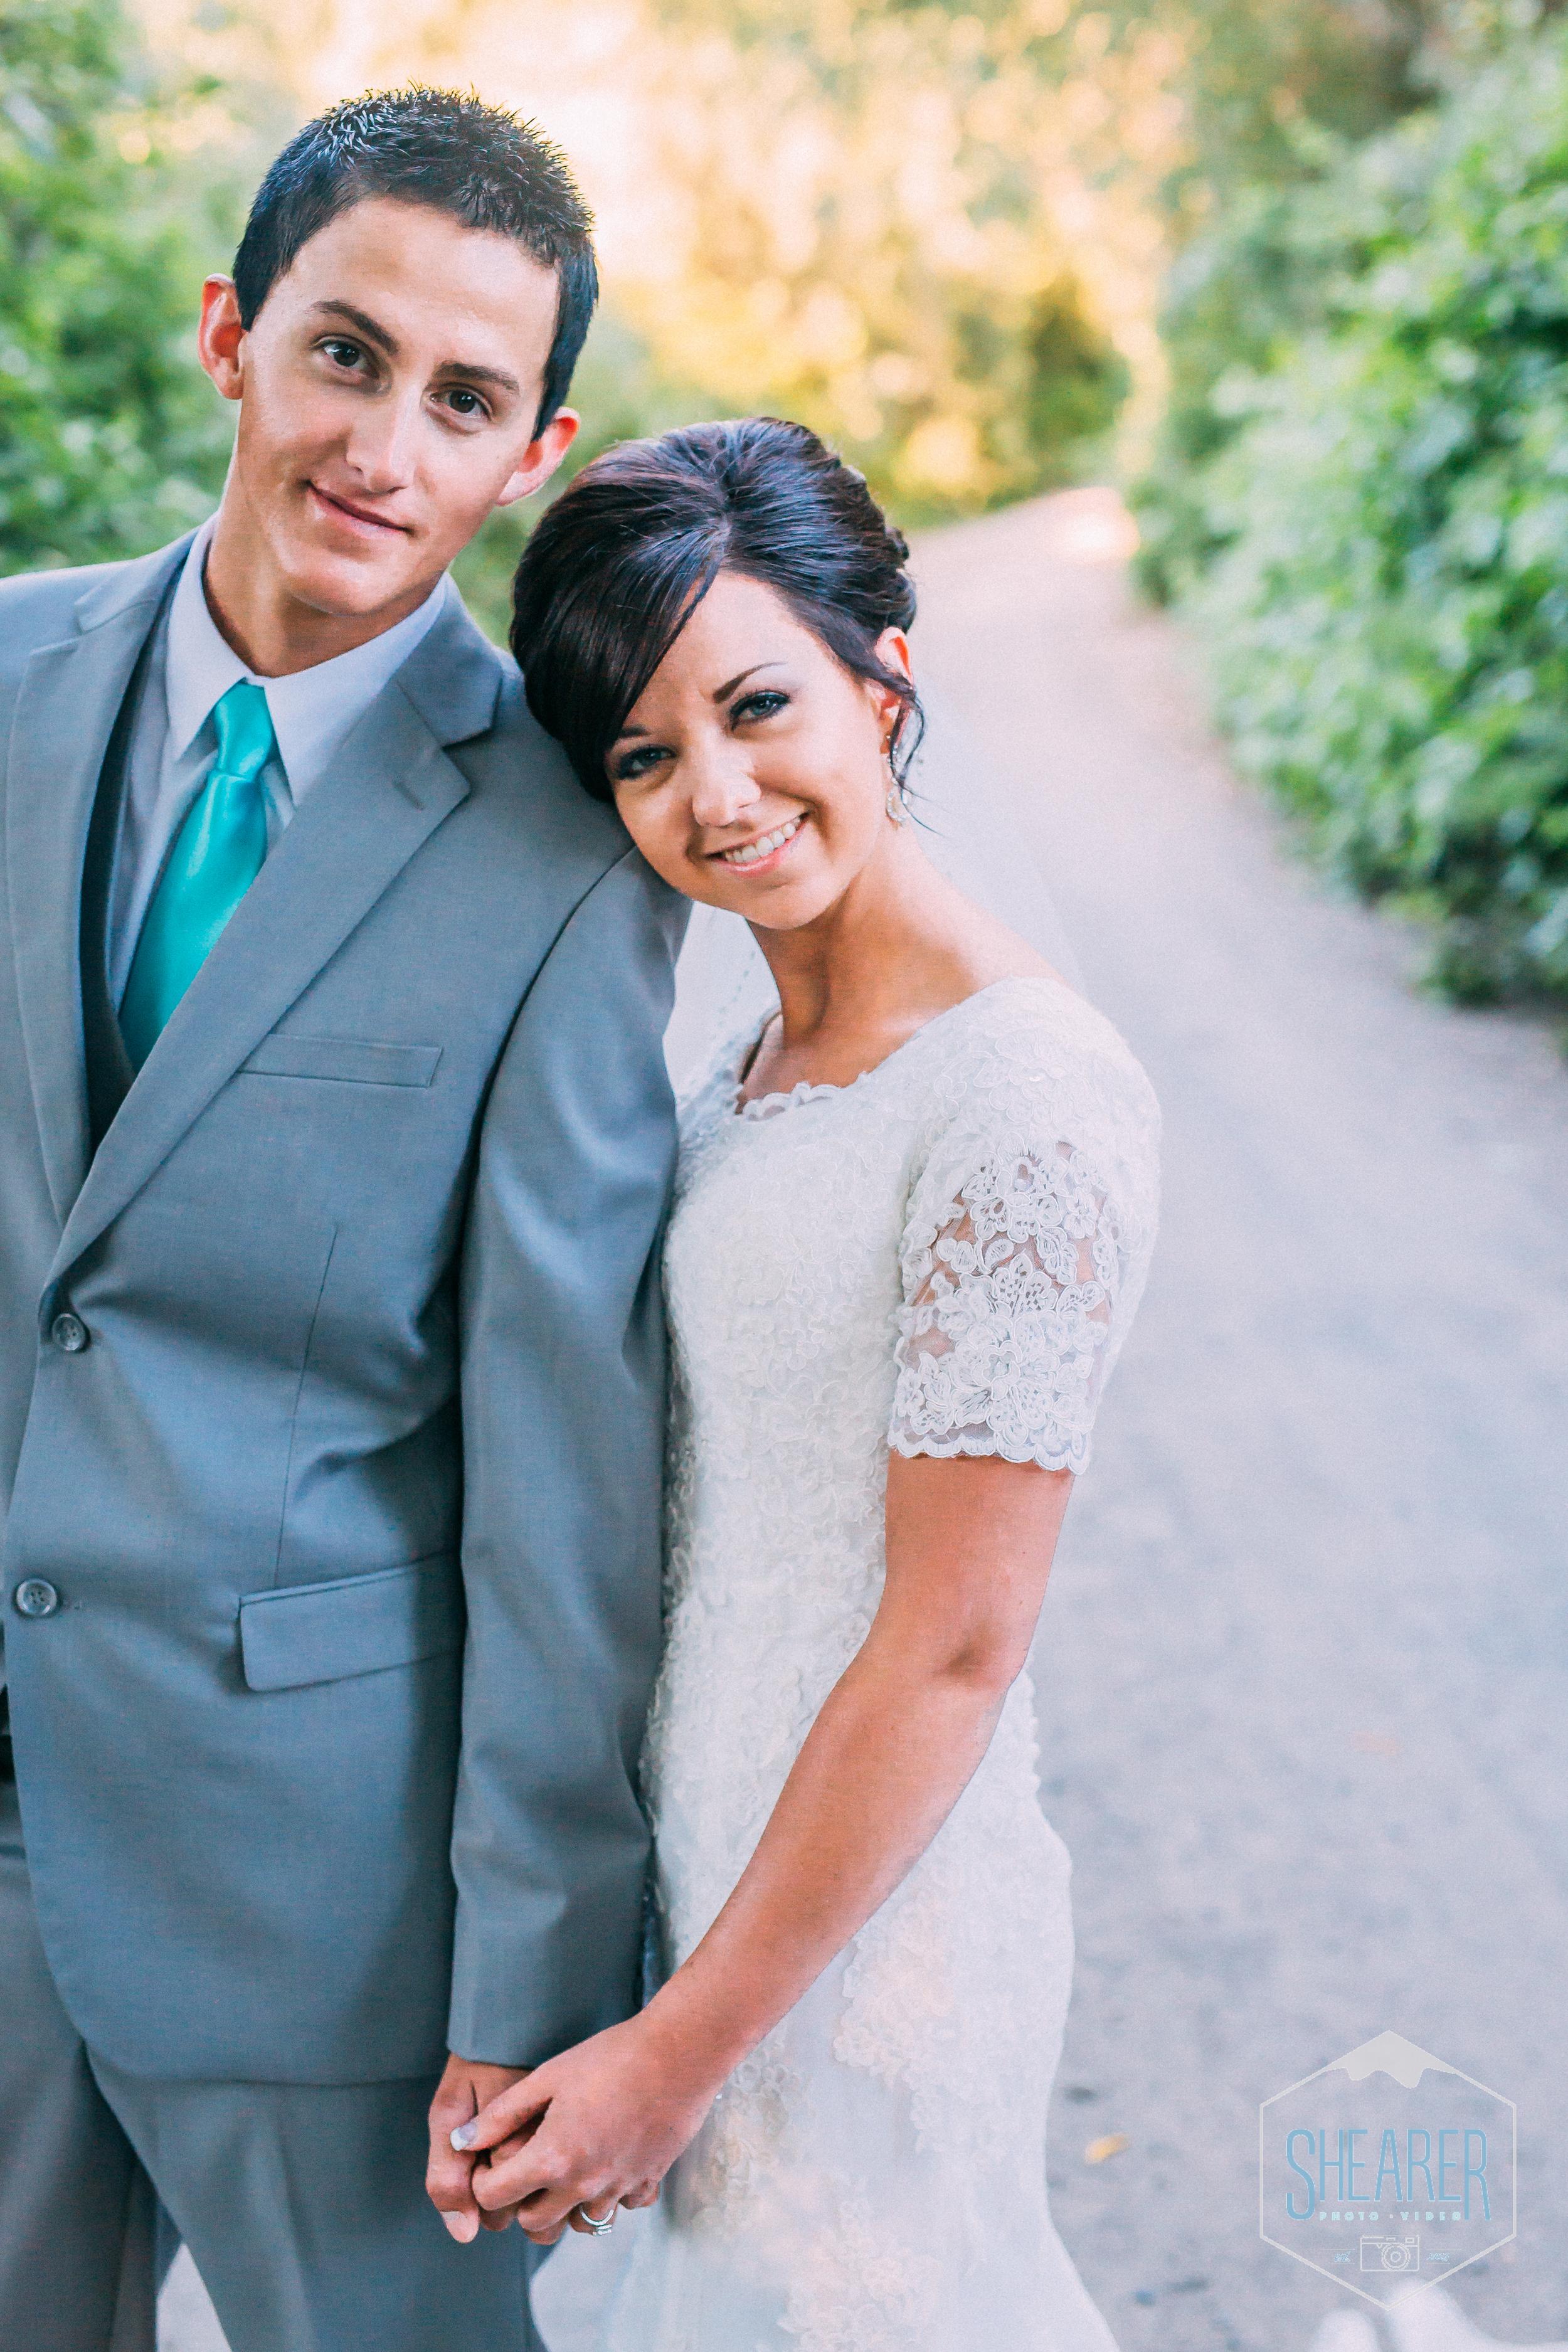 Tyler and Megin Shearer Photo and Video Kayla and Colton bridals wedding rexburg idaho-126.jpg